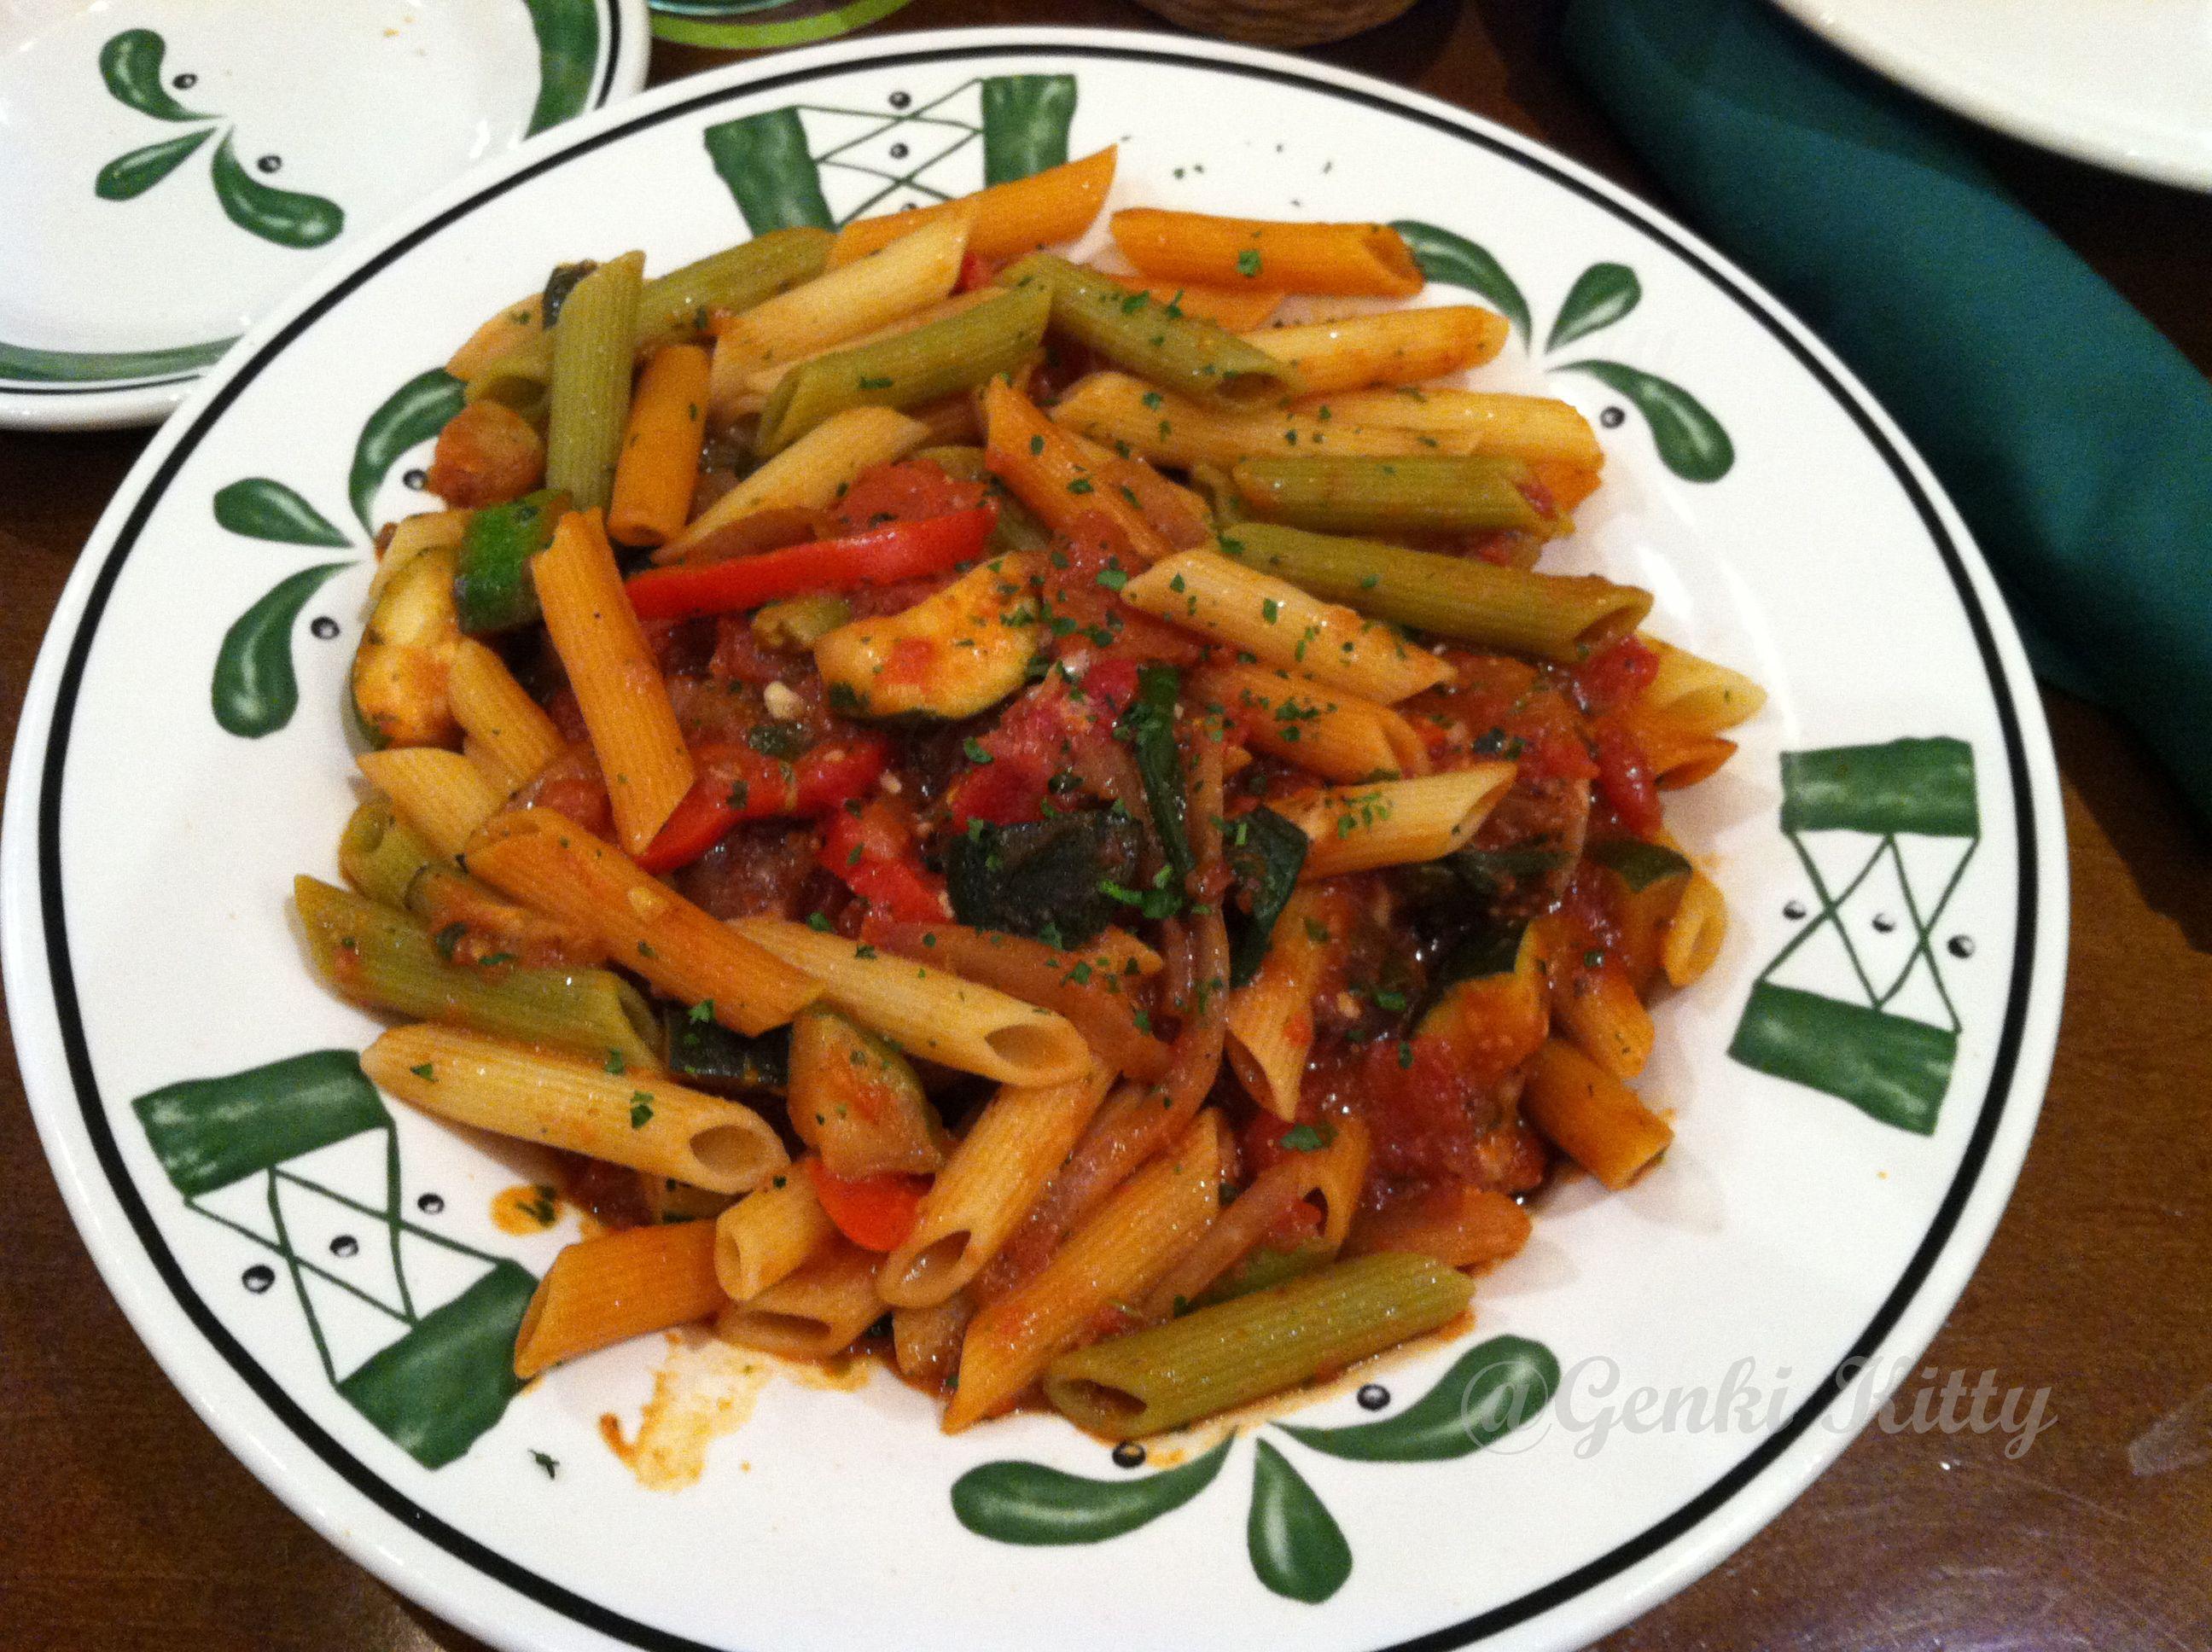 Vegan Options at the Olive Garden Vegan restaurants